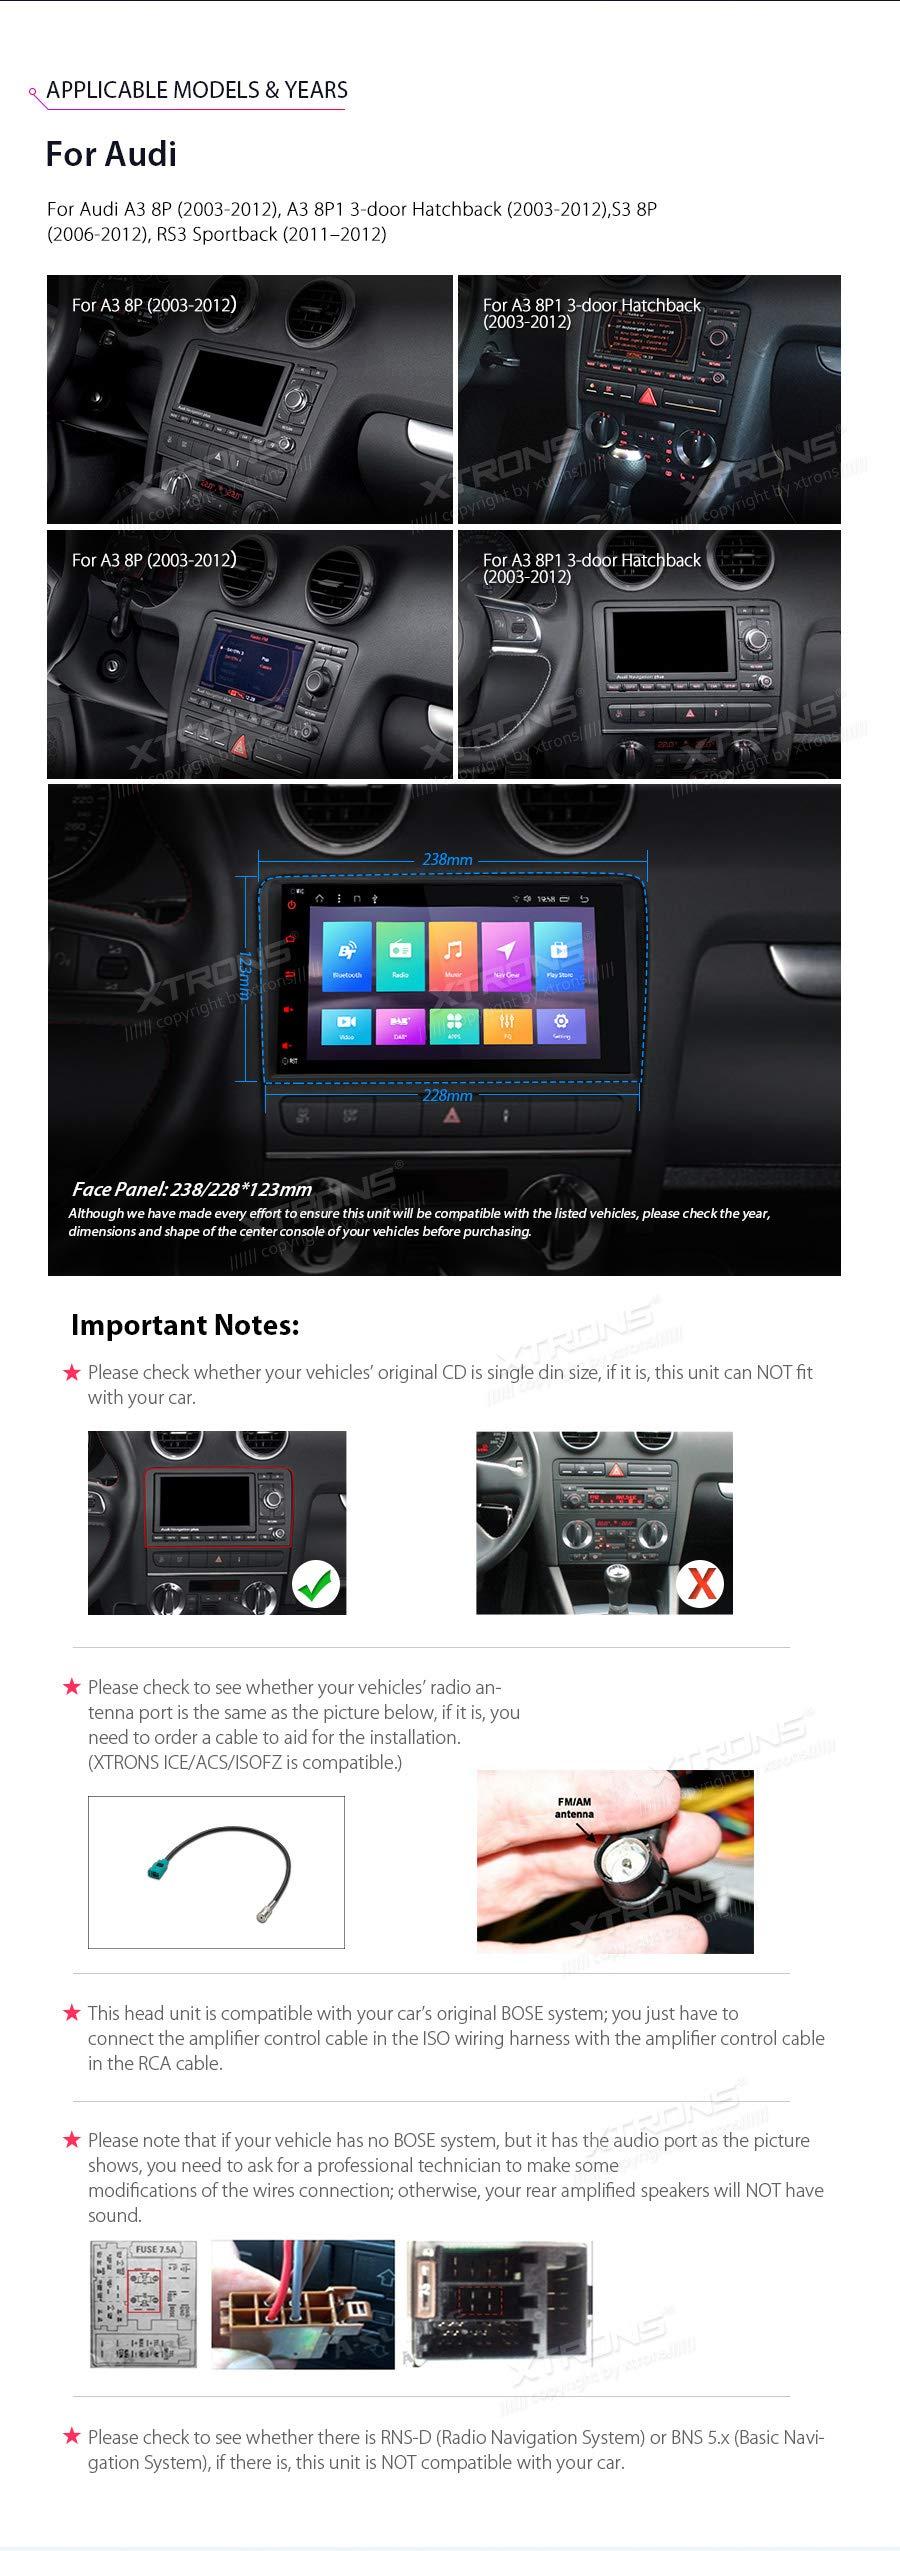 XTRONS-8-Android-Autoradio-mit-Touchscreen-Multimedia-Player-mit-Android-81-Octa-Core-Multimedia-Player-unterstzt-TPMS-WiFi-4G-Bluetooth50-2GB-RAM-32GB-ROM-DAB-OBD2-FR-Audi-A3S3RS3